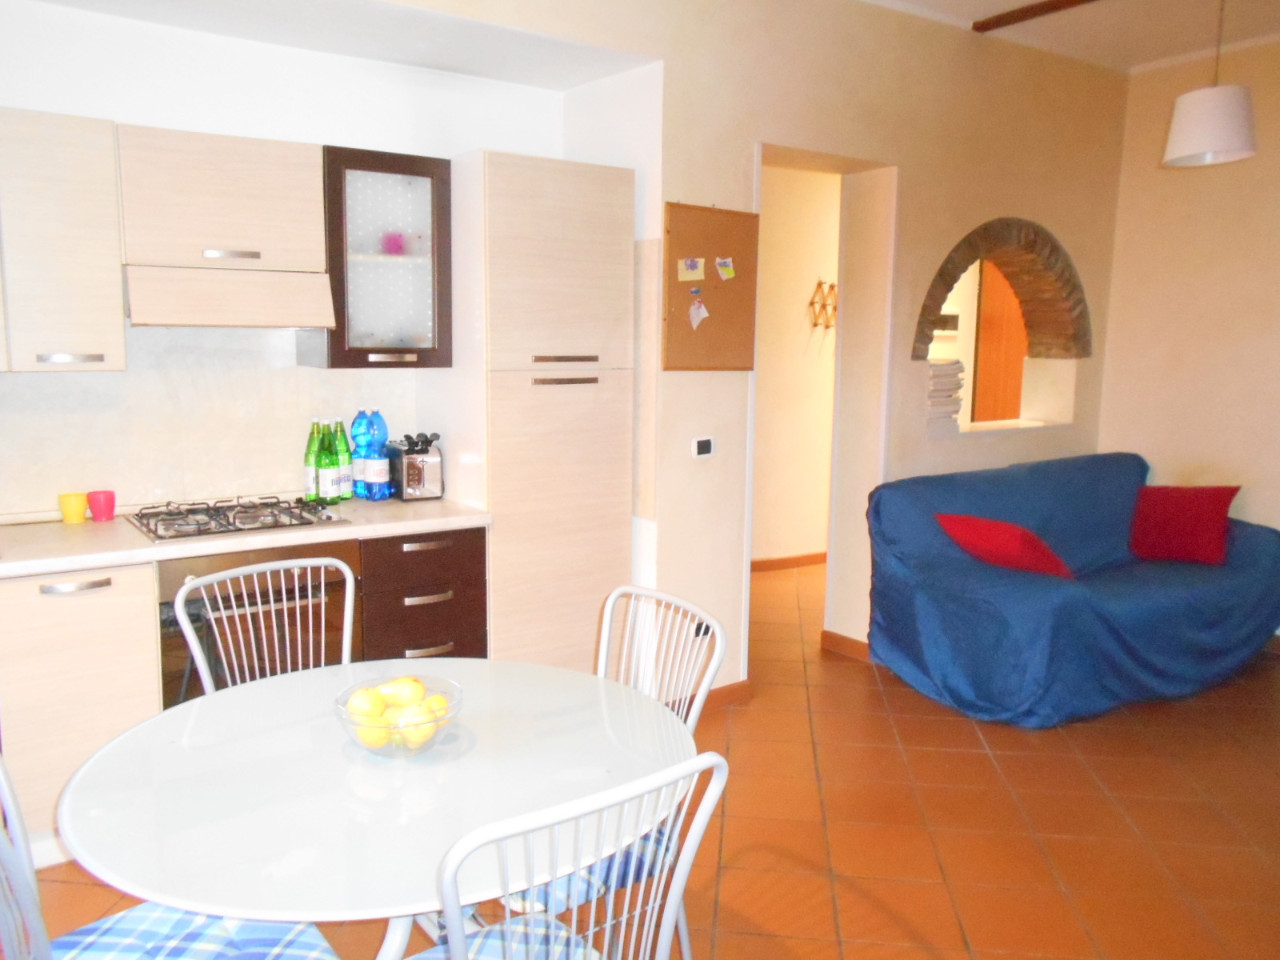 Appartamento a Ferrara (Ferrara) in Affitto